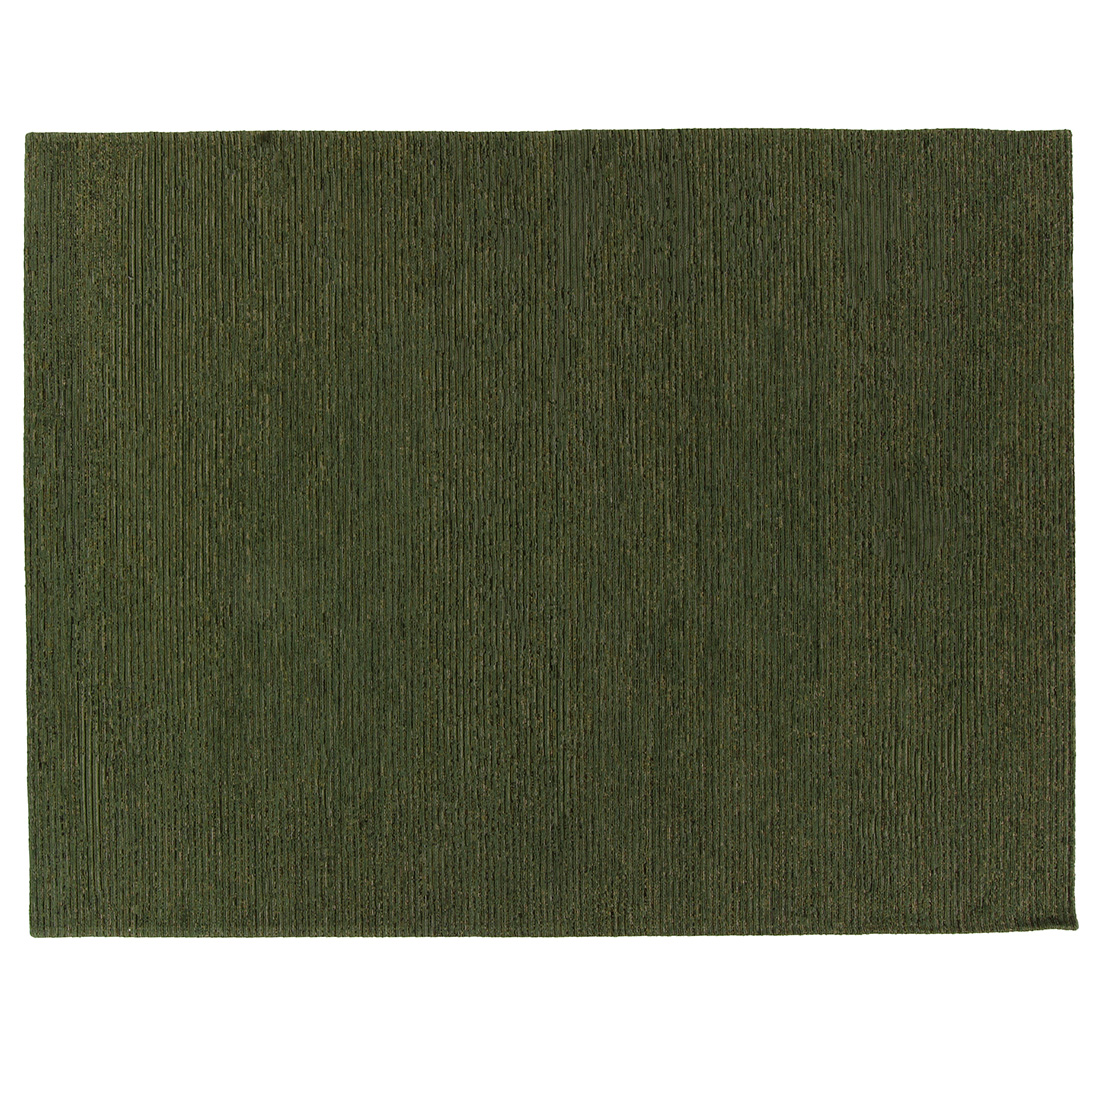 Vloerkleed Brinker Bolzano Army Green | 170 x 230 cm